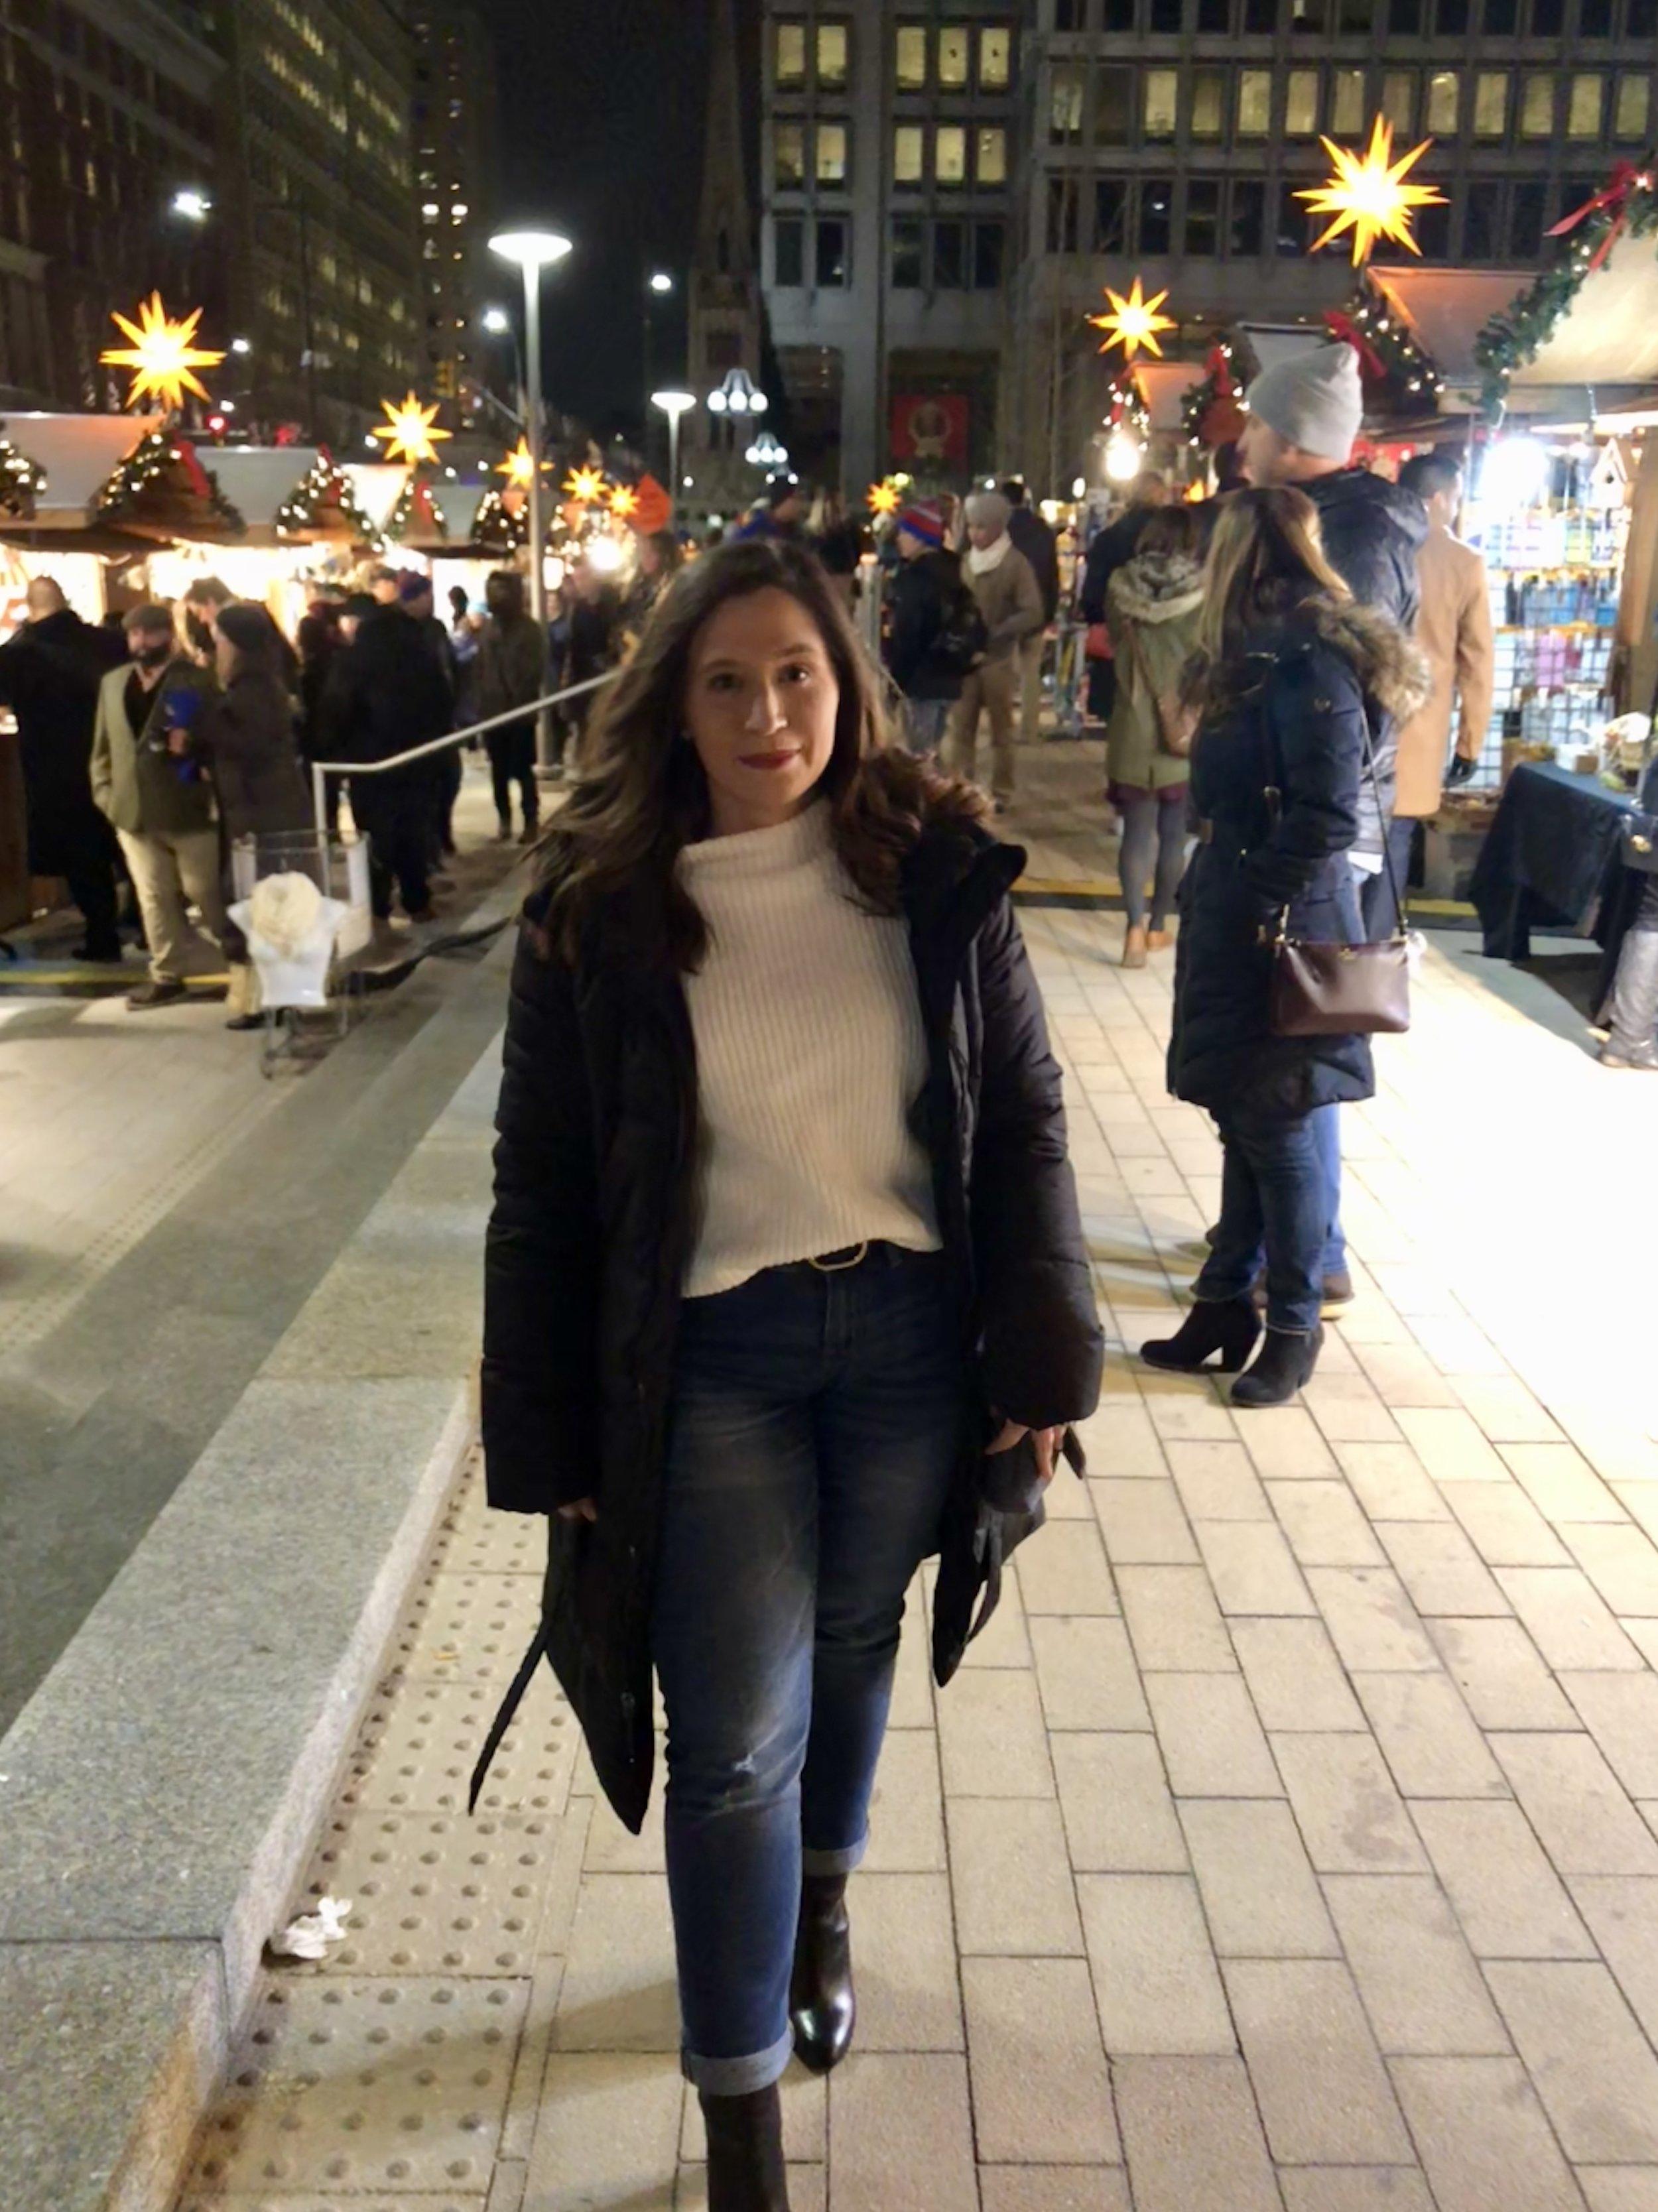 how to style boyfriend jeans, target style, target sweater, winter outfit ideas, boyfriend jeans winter